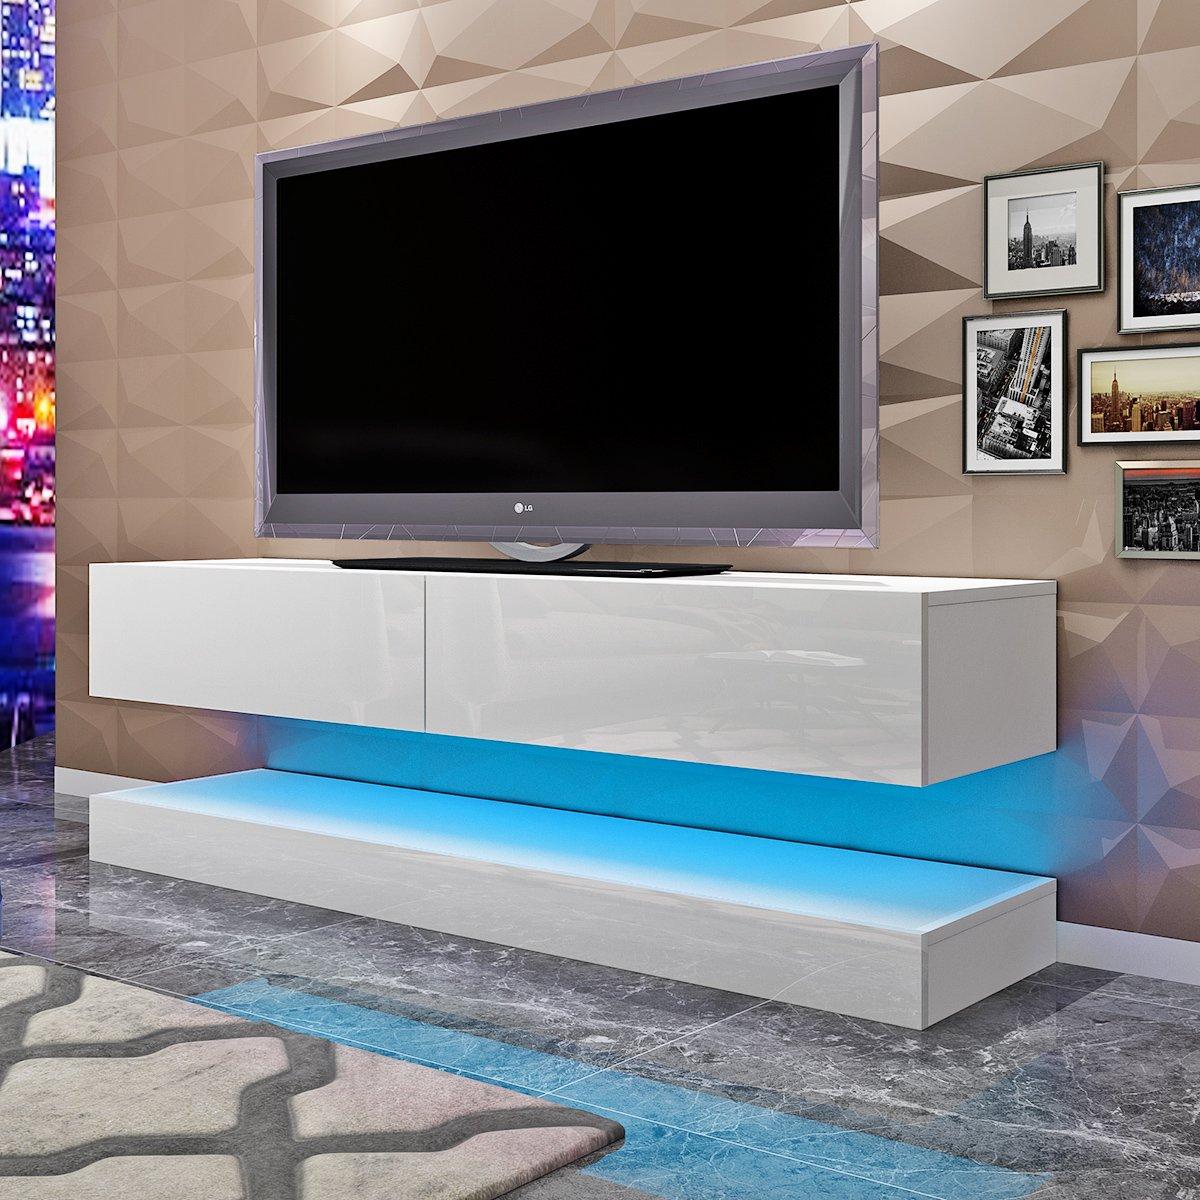 Modern 140cm LED TV Cabinet Unit Floating TV Stand Table for Living Room with 2 Drawers White High Gloss Door Matt Side Body White